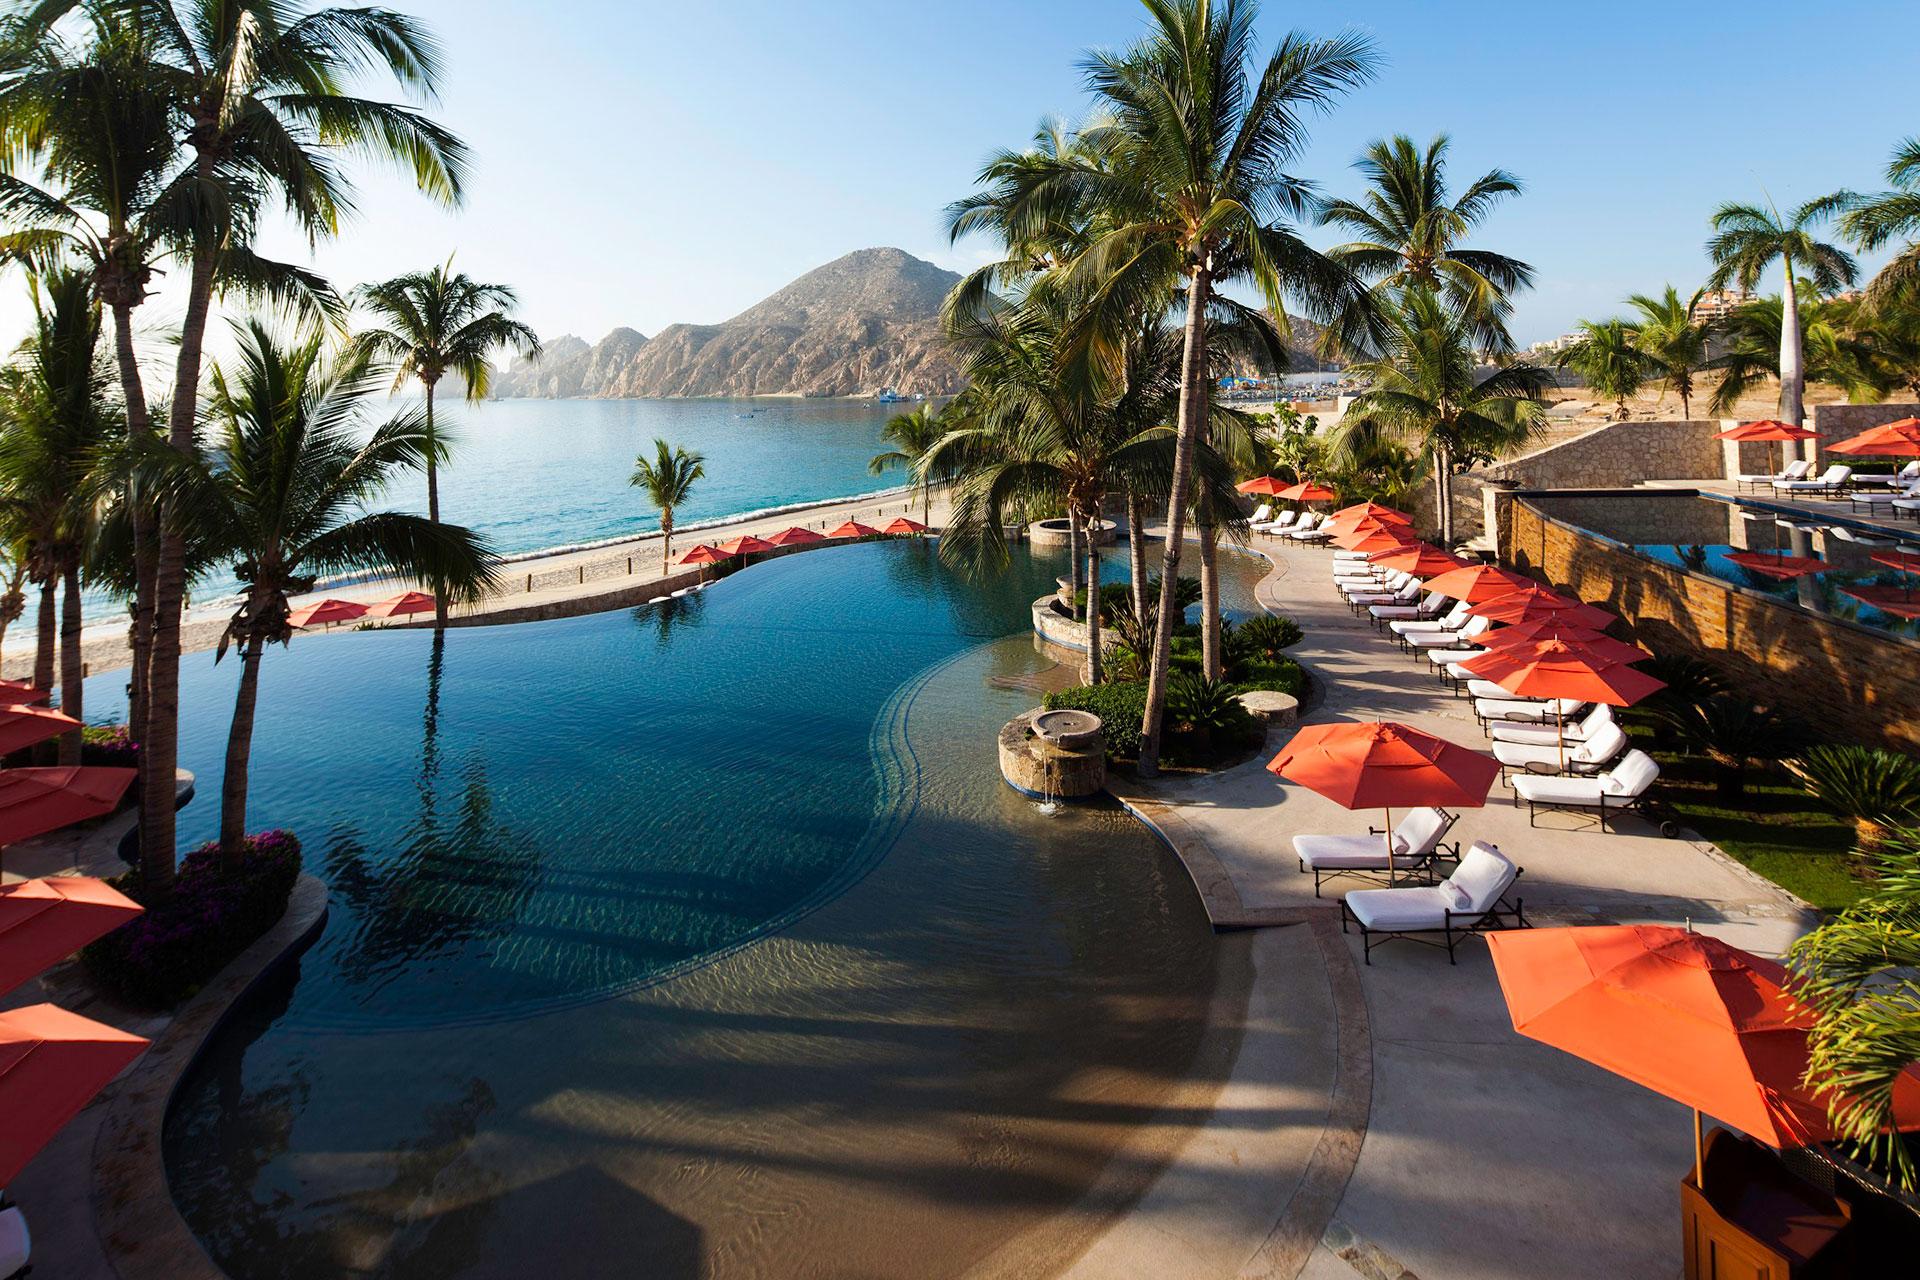 Hacienda Beach Club & Residences; Courtesy of Hacienda Beach Club & Residences